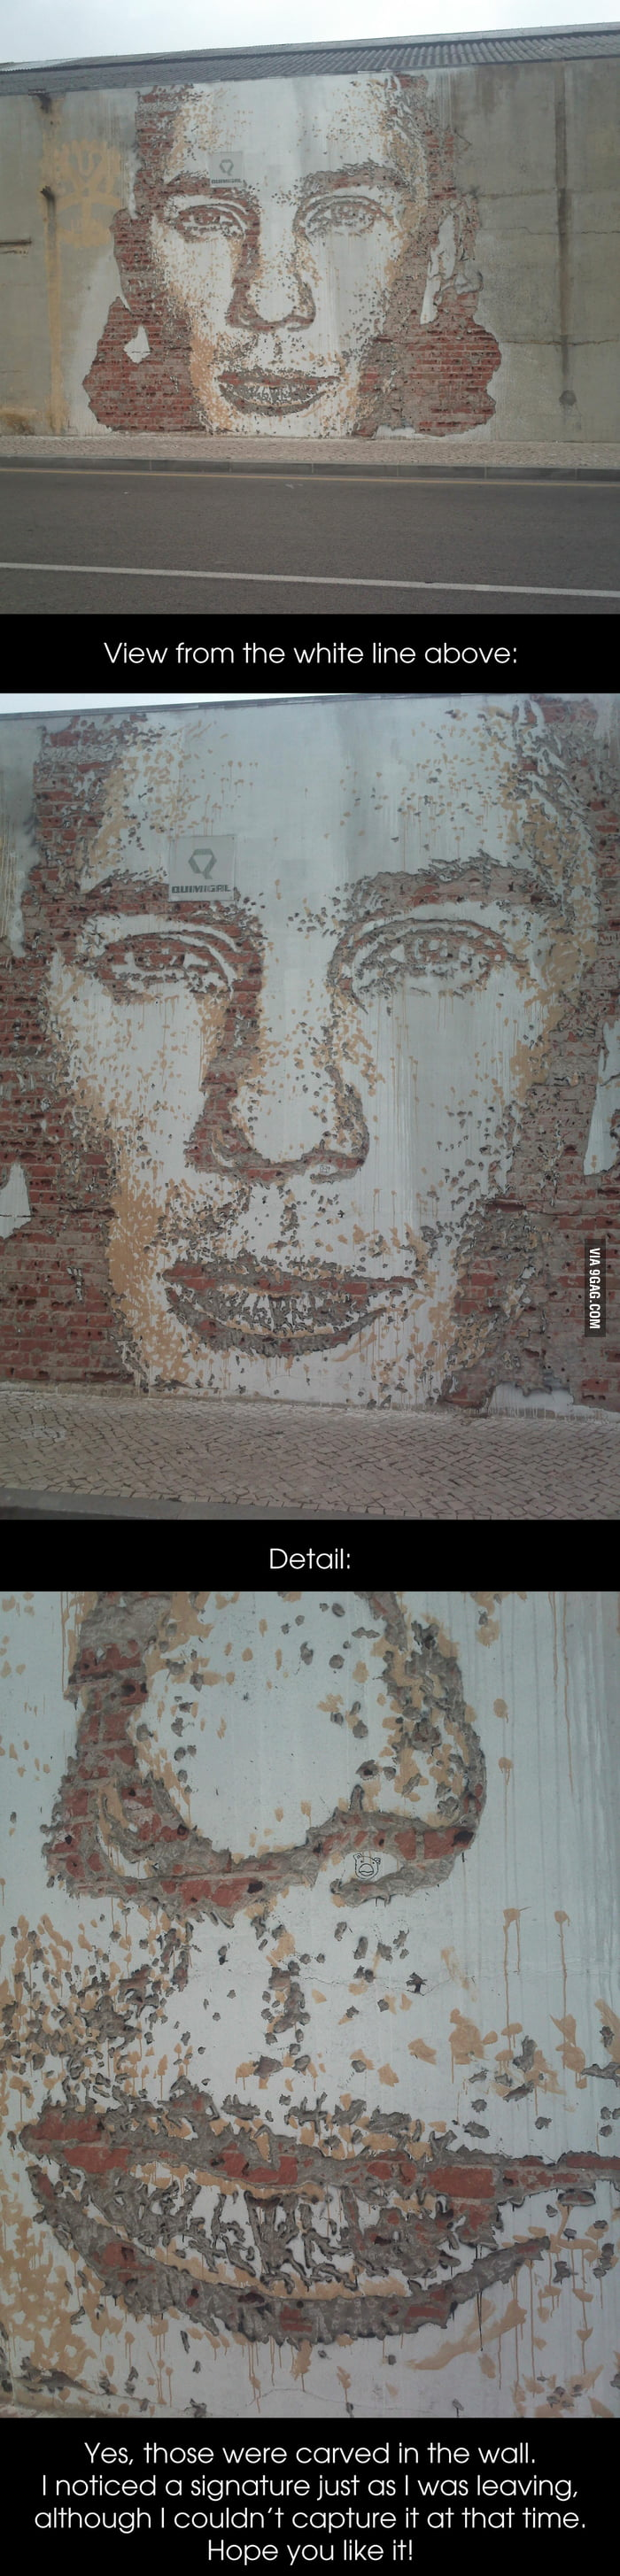 Street Art Outside Aveiro Train Station